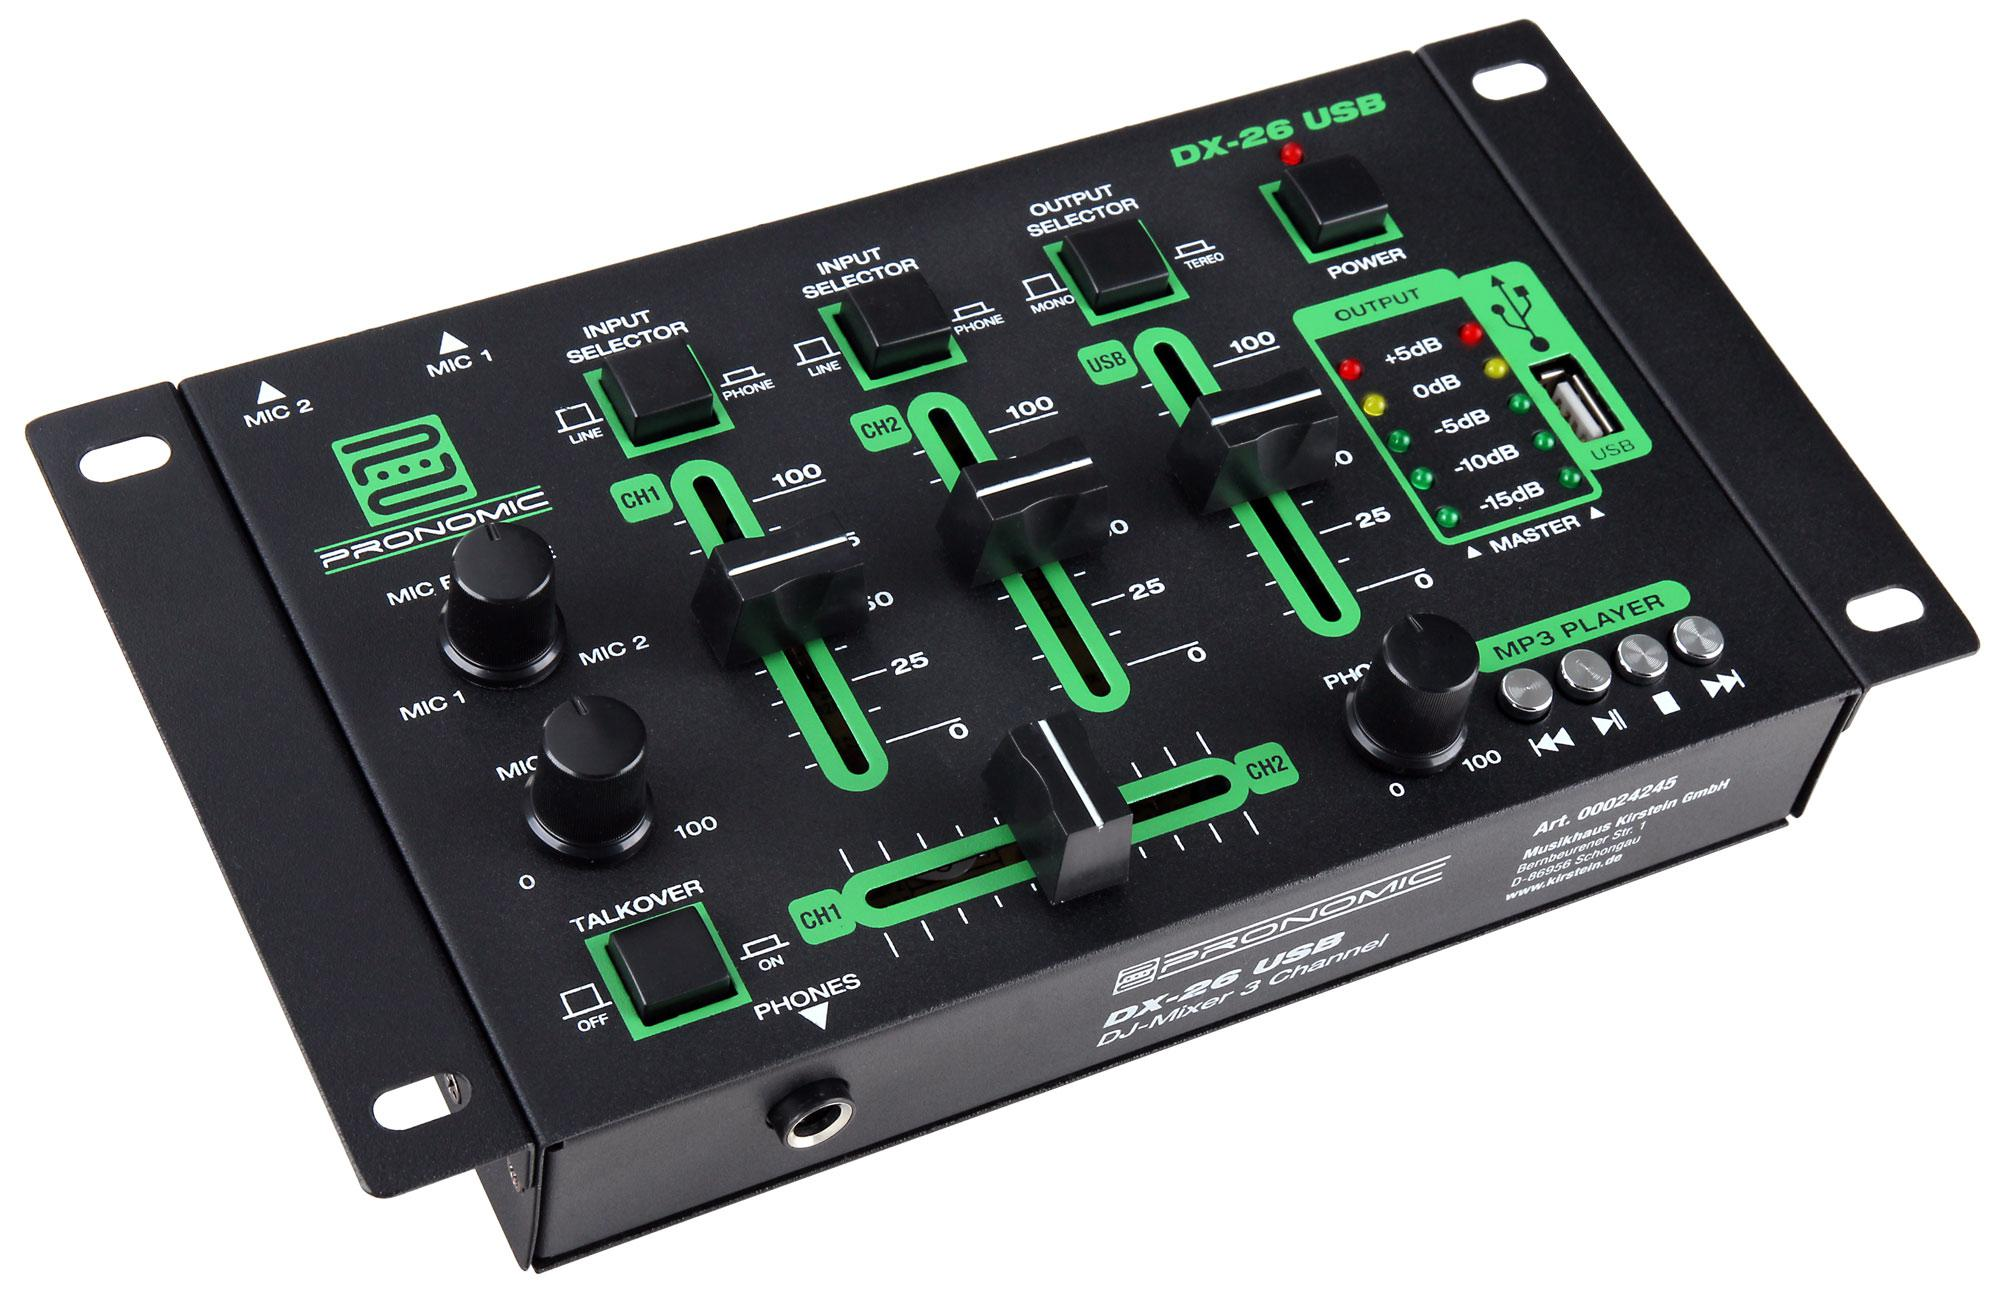 Pronomic DX-26 USB DJ-Mixer